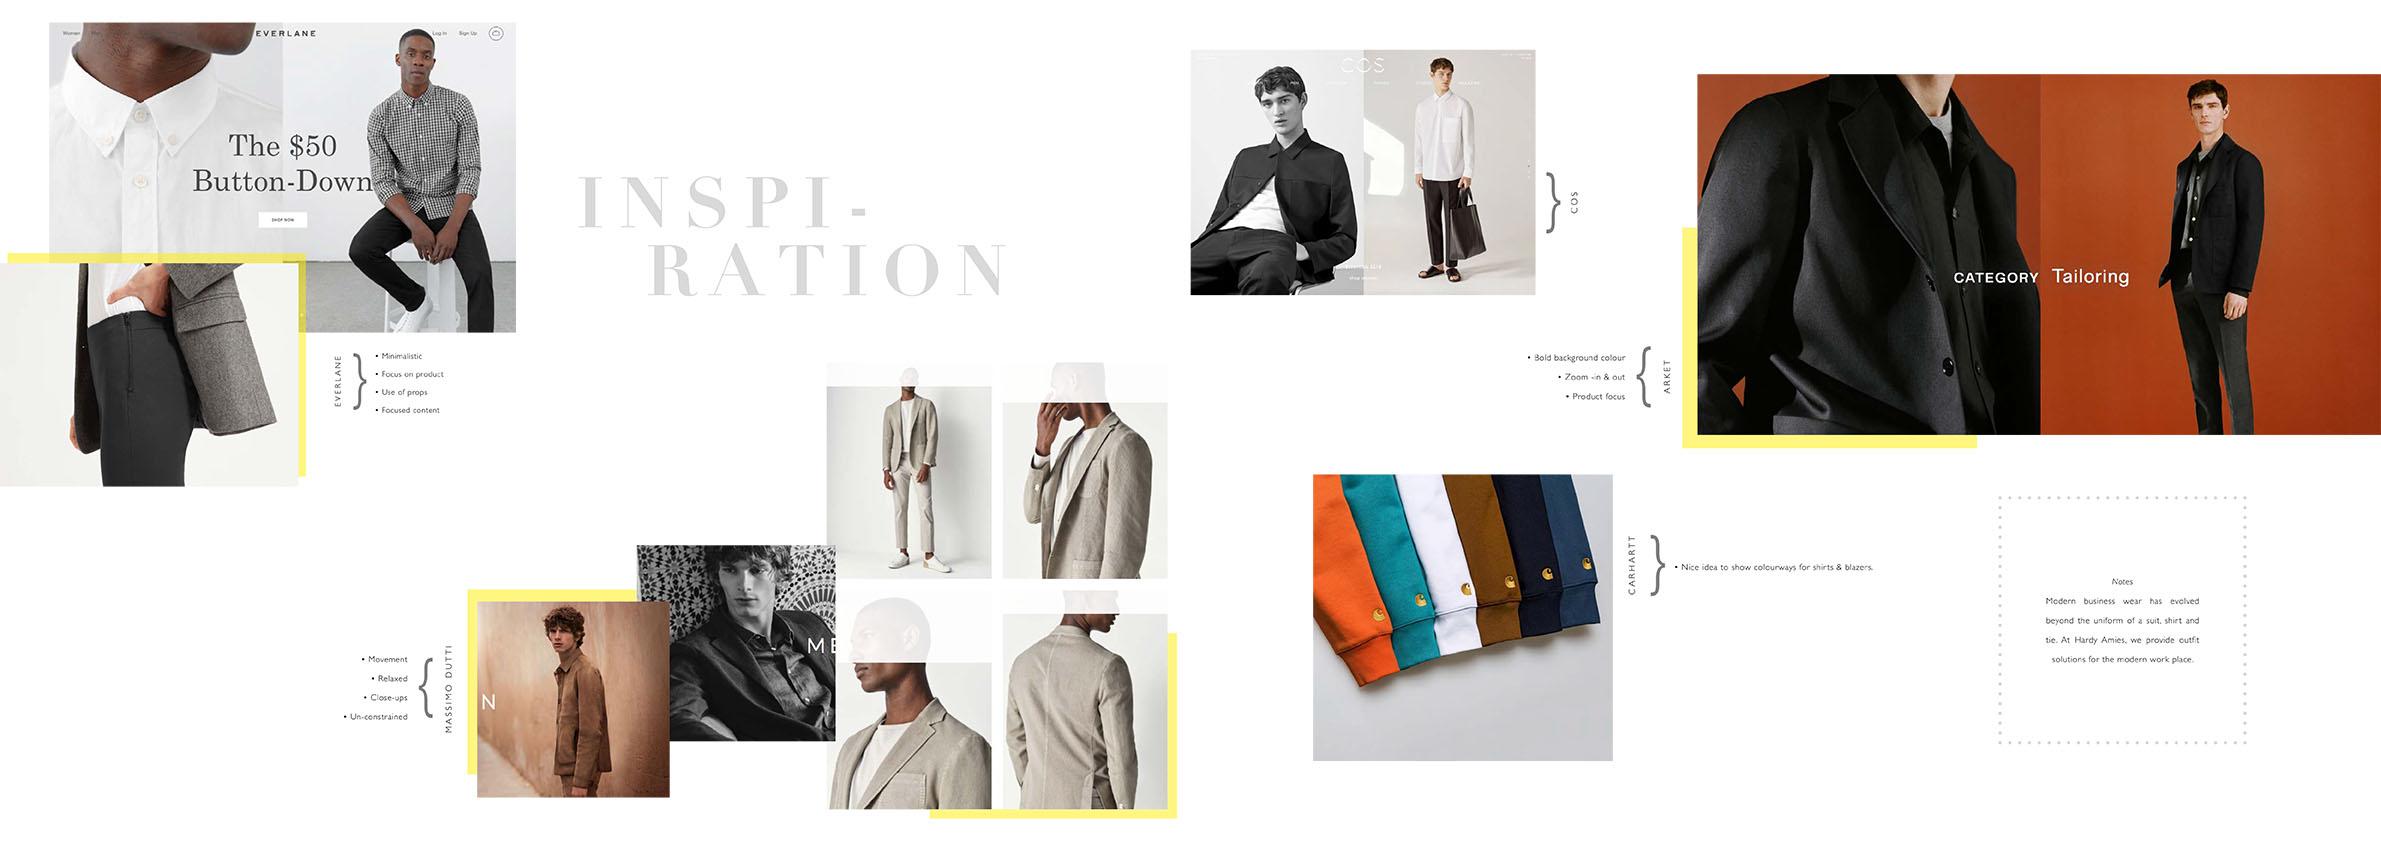 lauren-grace-design-freelance-london-art-direction-fashion-menswear-1.jpg